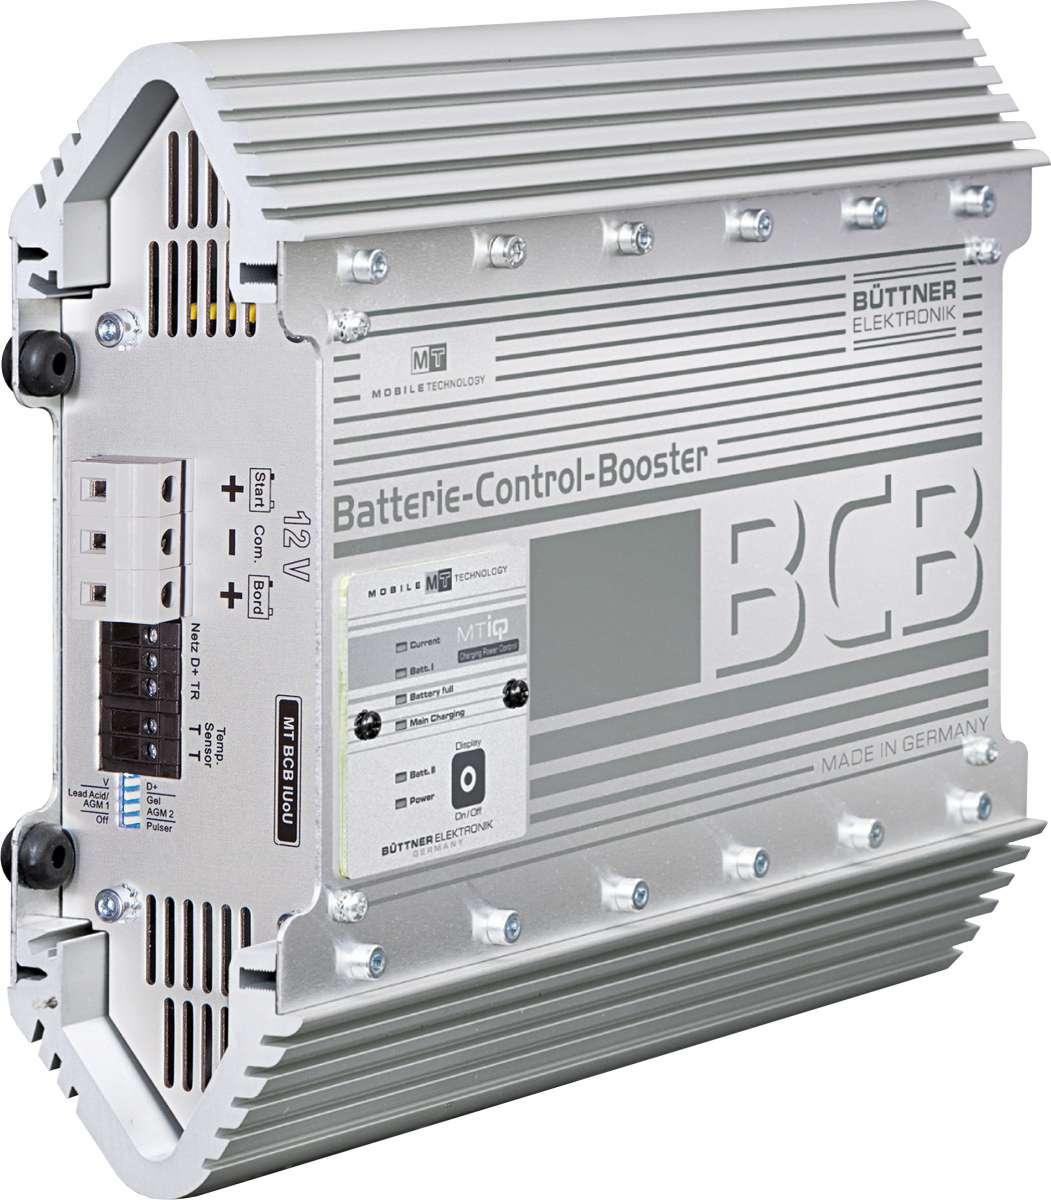 Batterie-Control-Booster MT BCB 30/30 IUoU   Elektro, Energieversorgung, Batterien & Ladegeräte